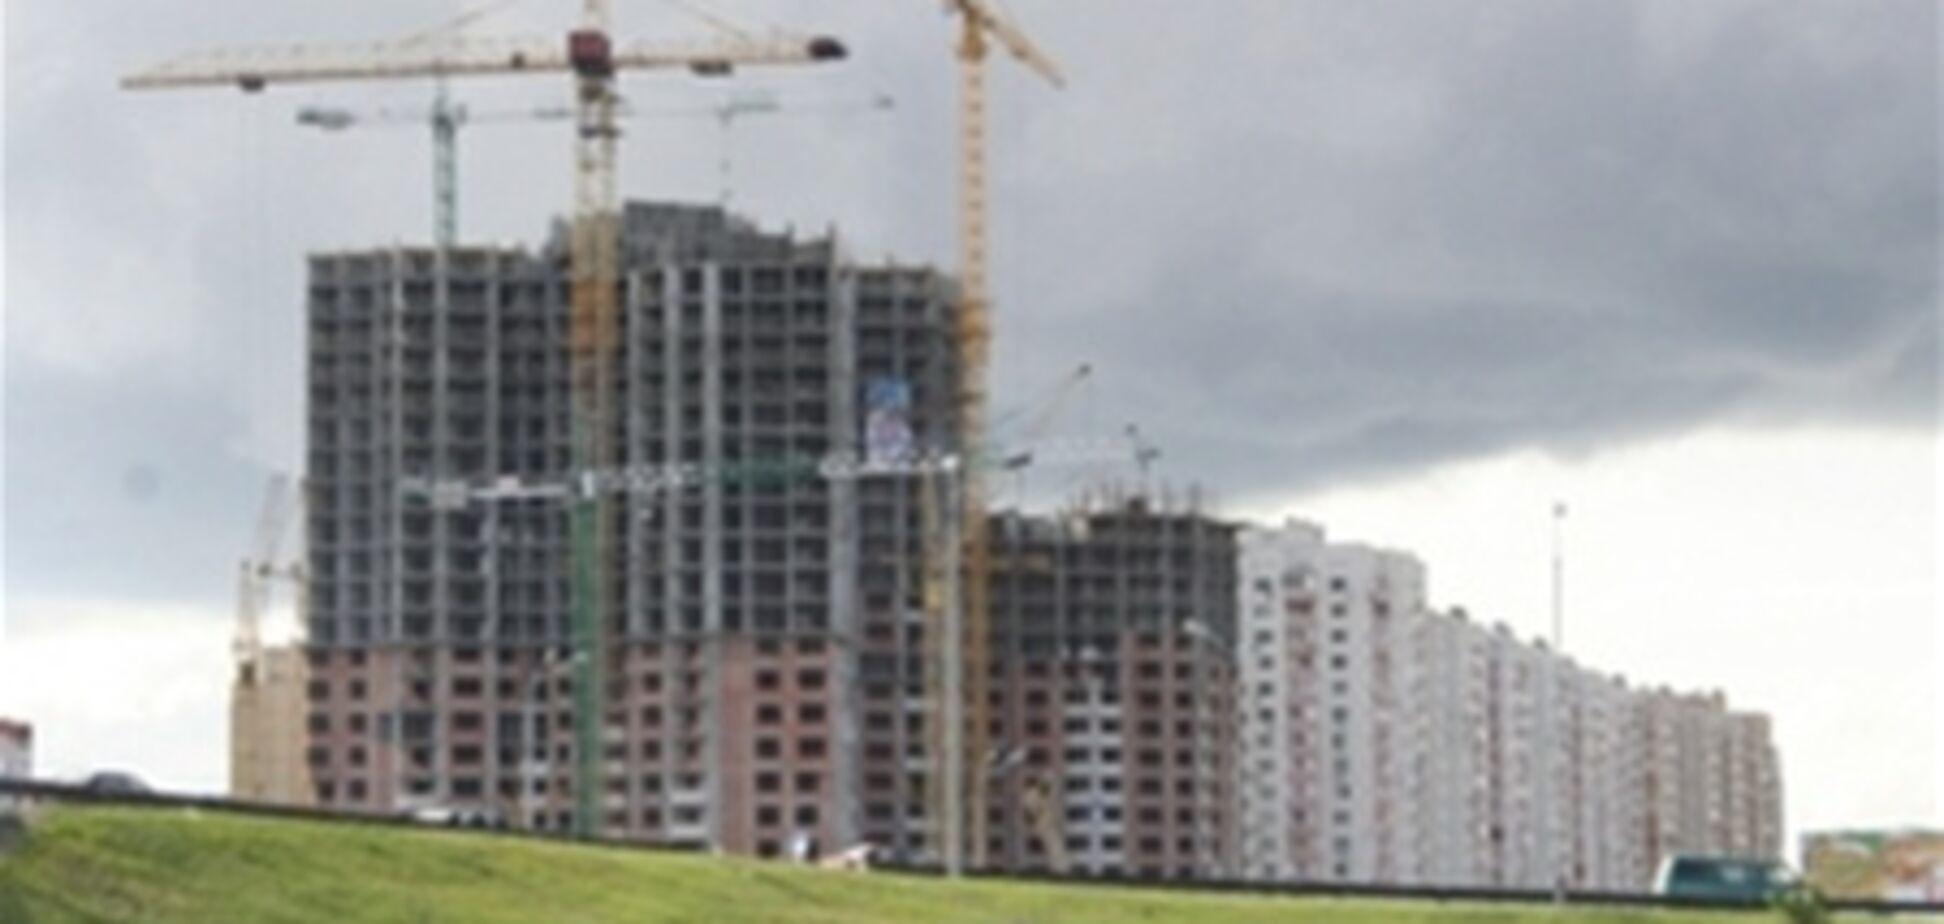 Киев в сентябре даст на дешевую ипотеку 25 млн грн